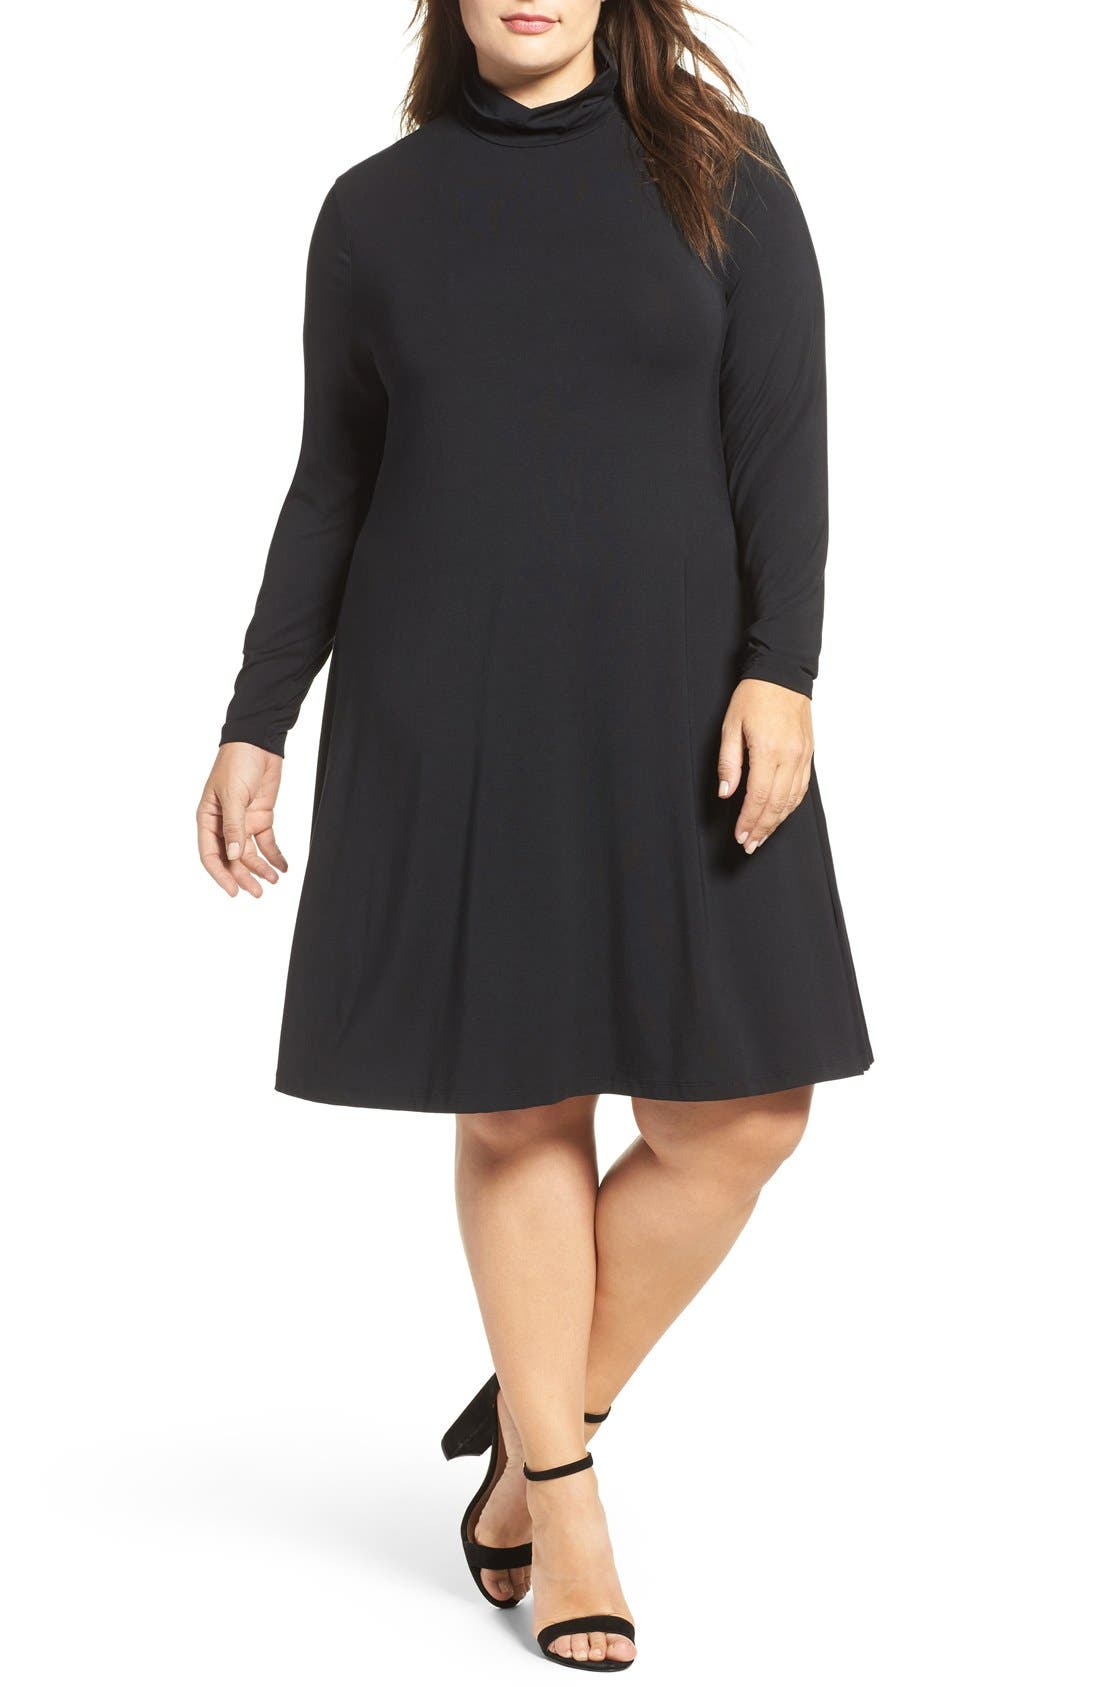 Sally Turtleneck A-Line Dress,                             Main thumbnail 1, color,                             001